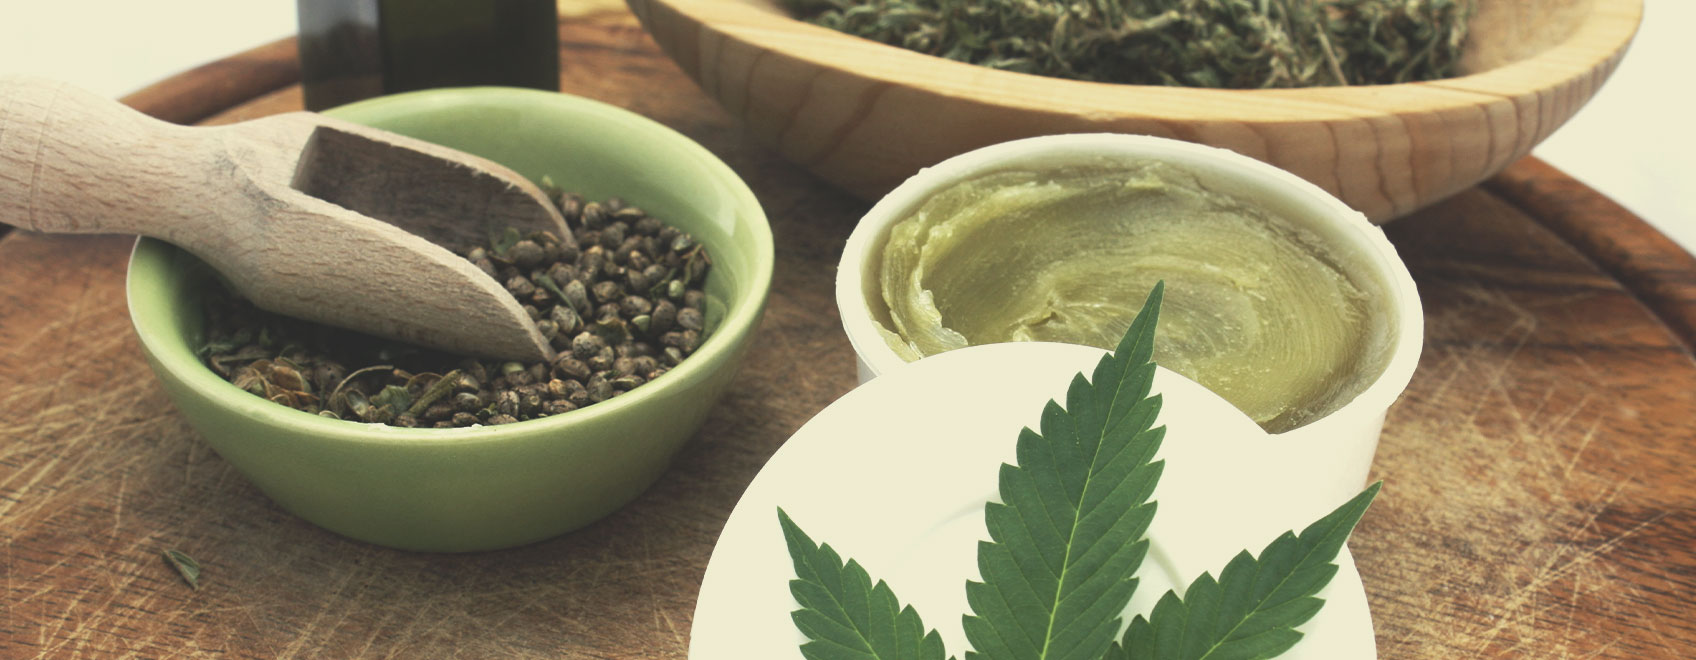 How To Make Organic Cannabis Salve